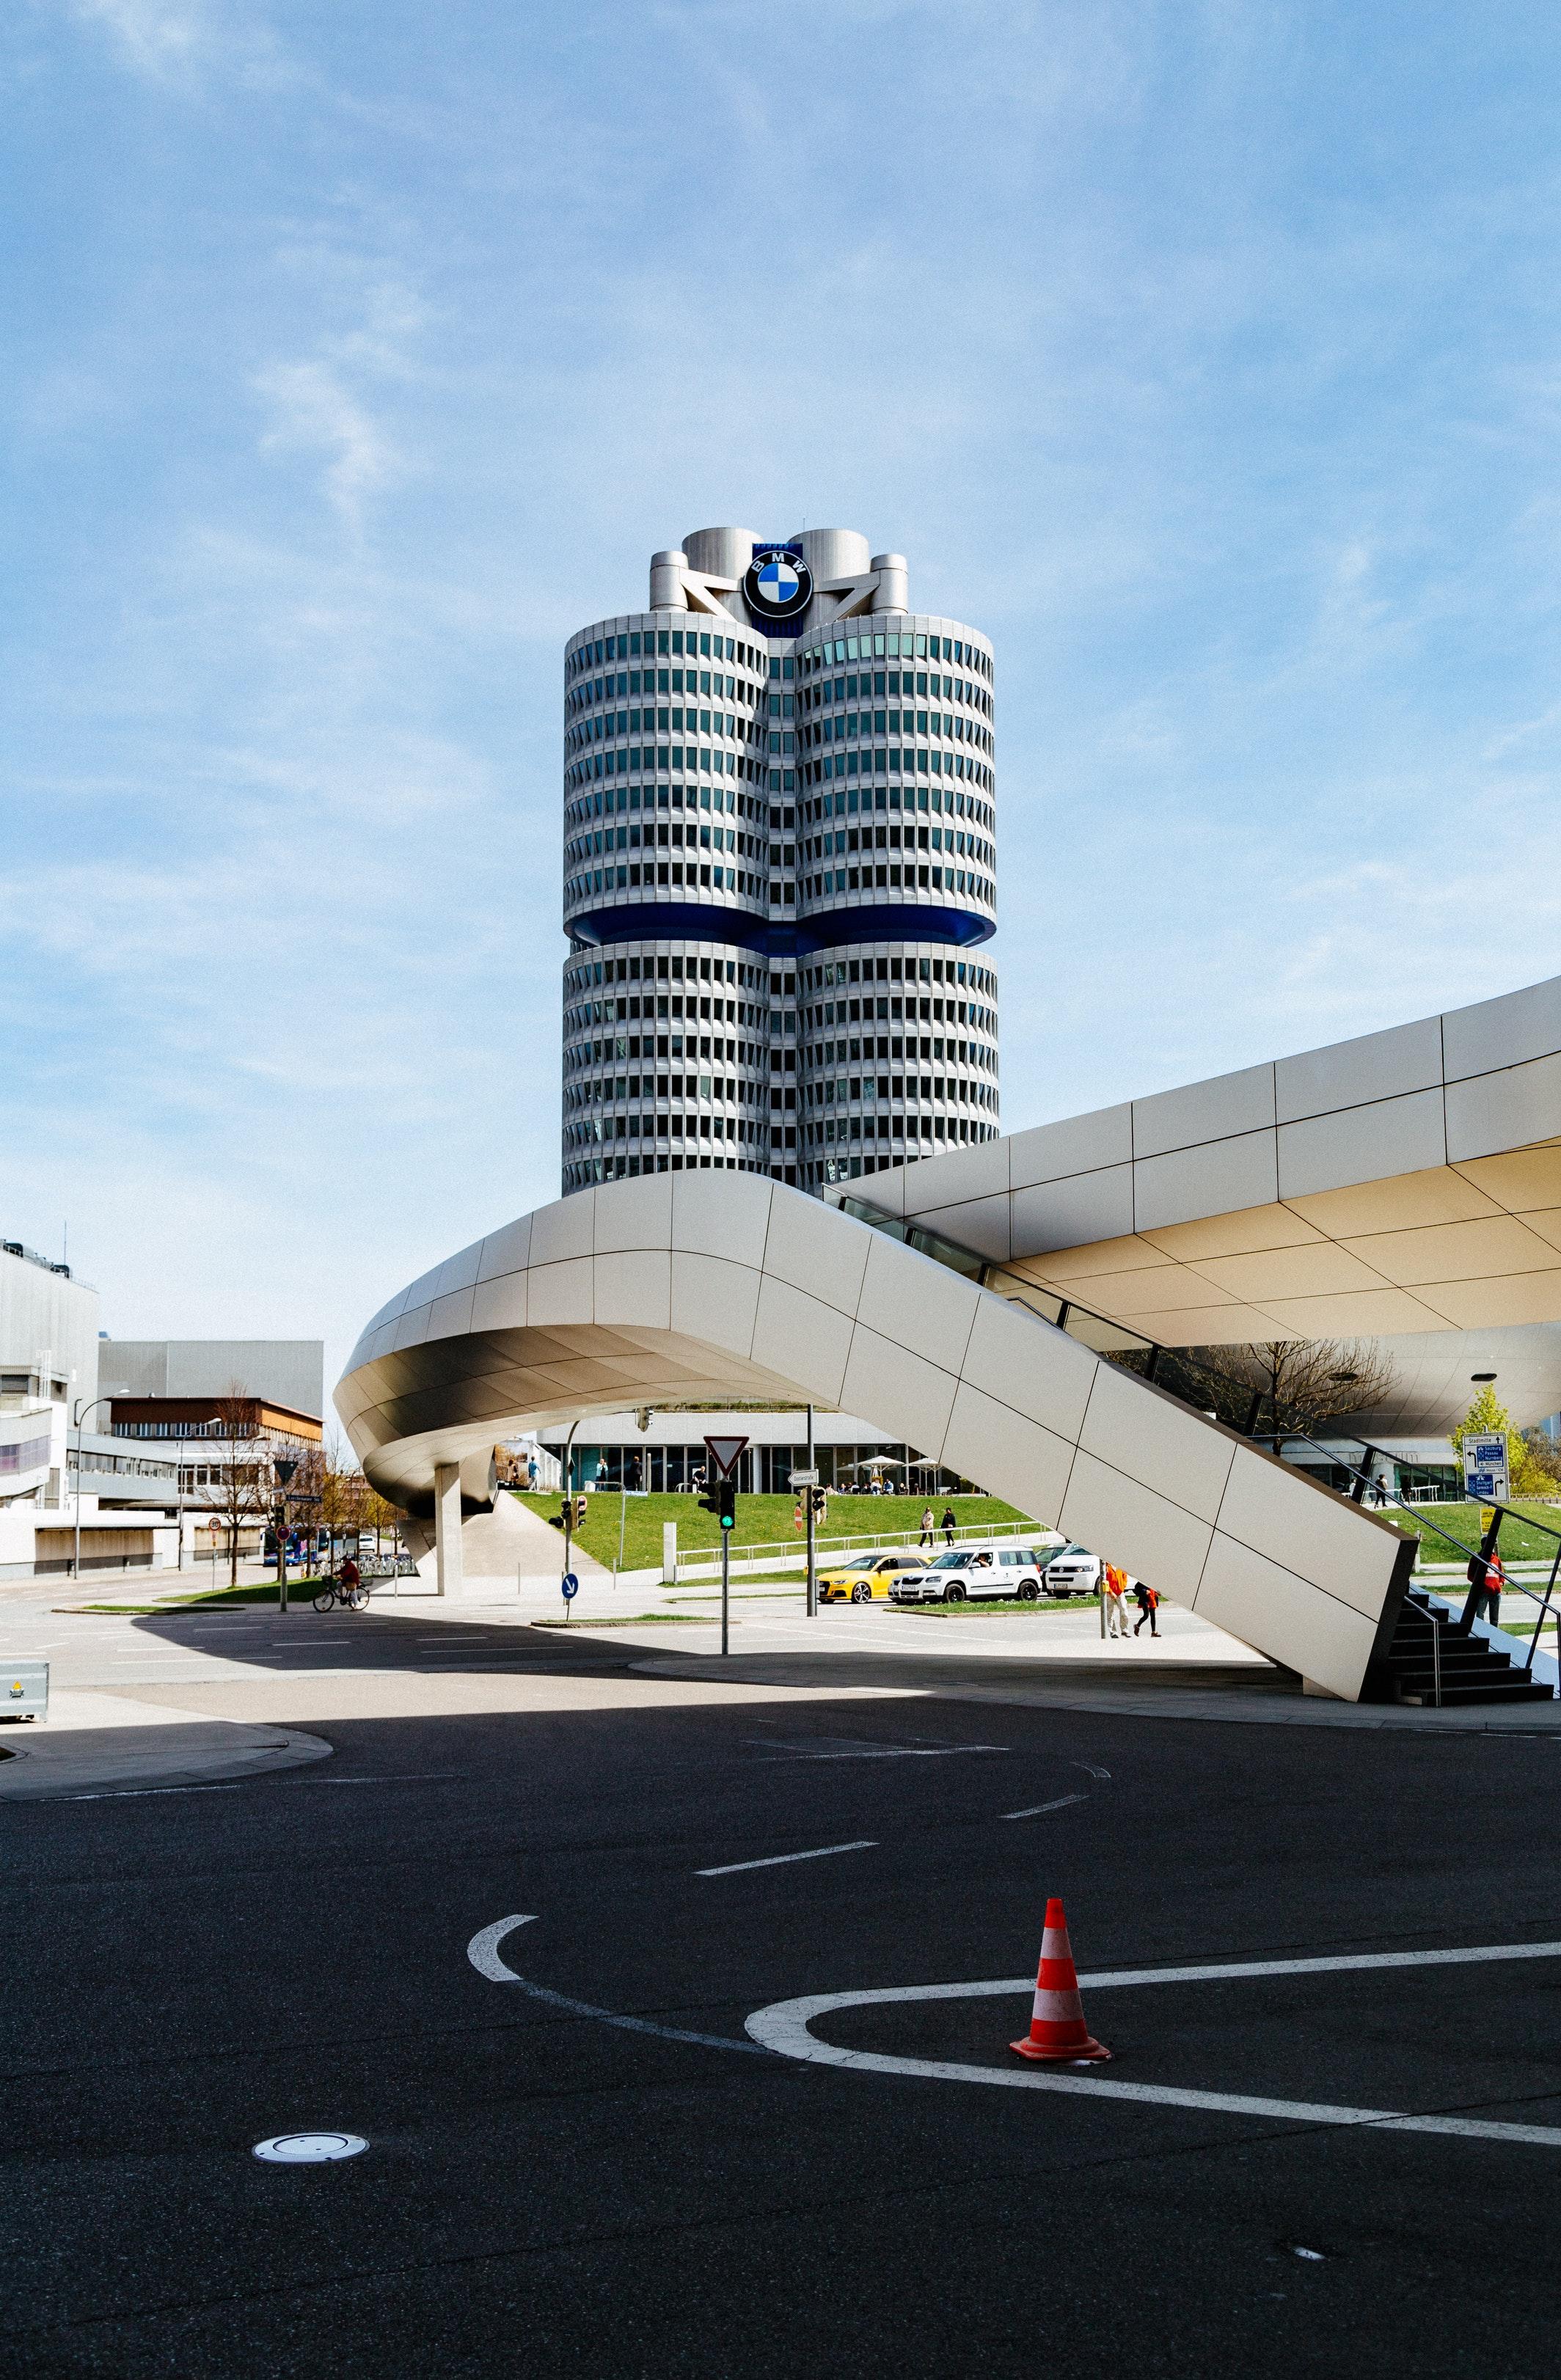 BMW-Welt--M-nchen--Germany-9